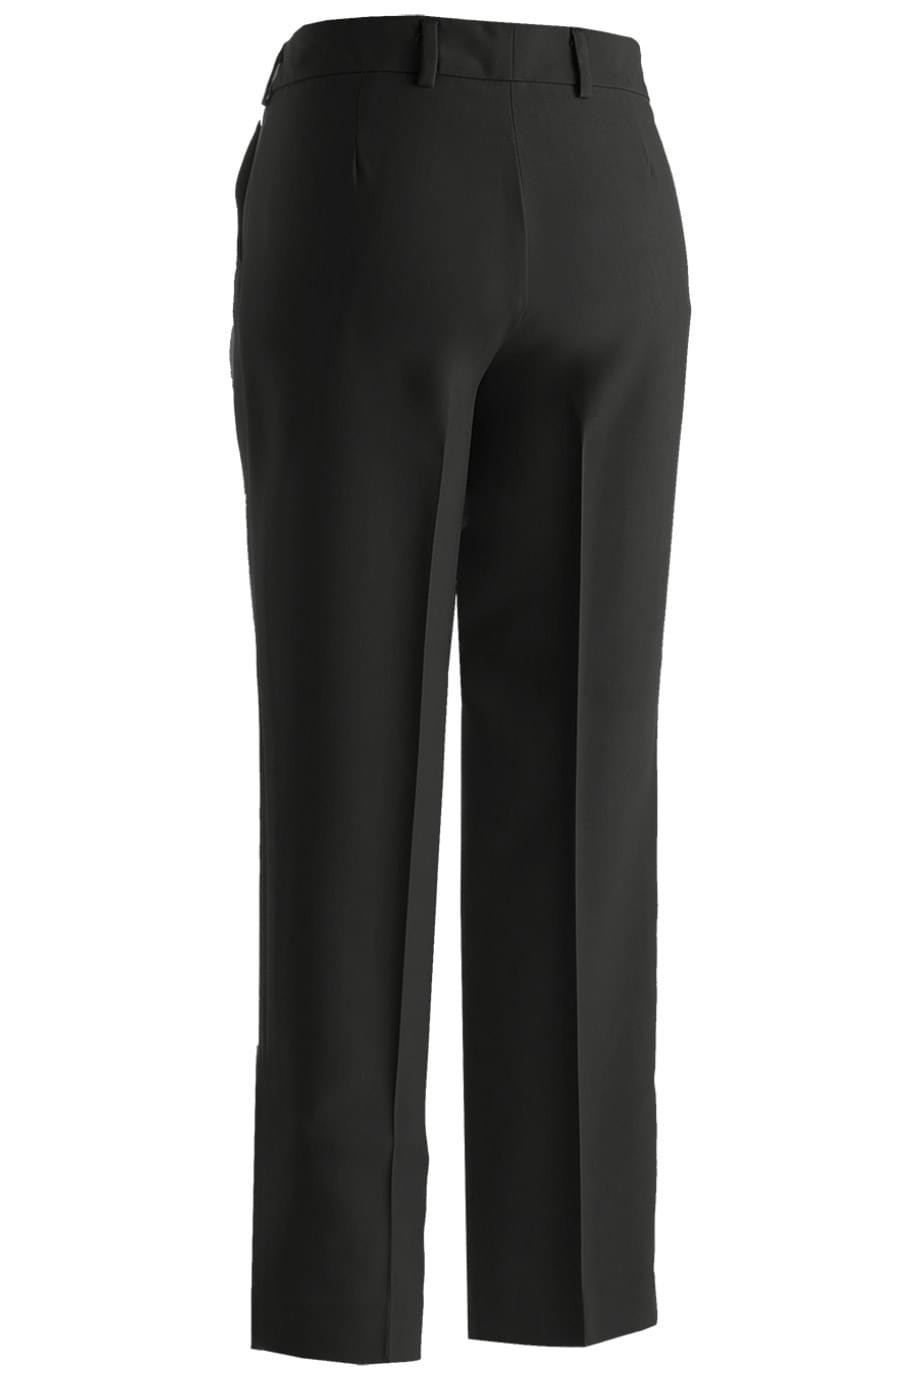 REDWOOD & ROSS® INTAGLIO DRESS PANT